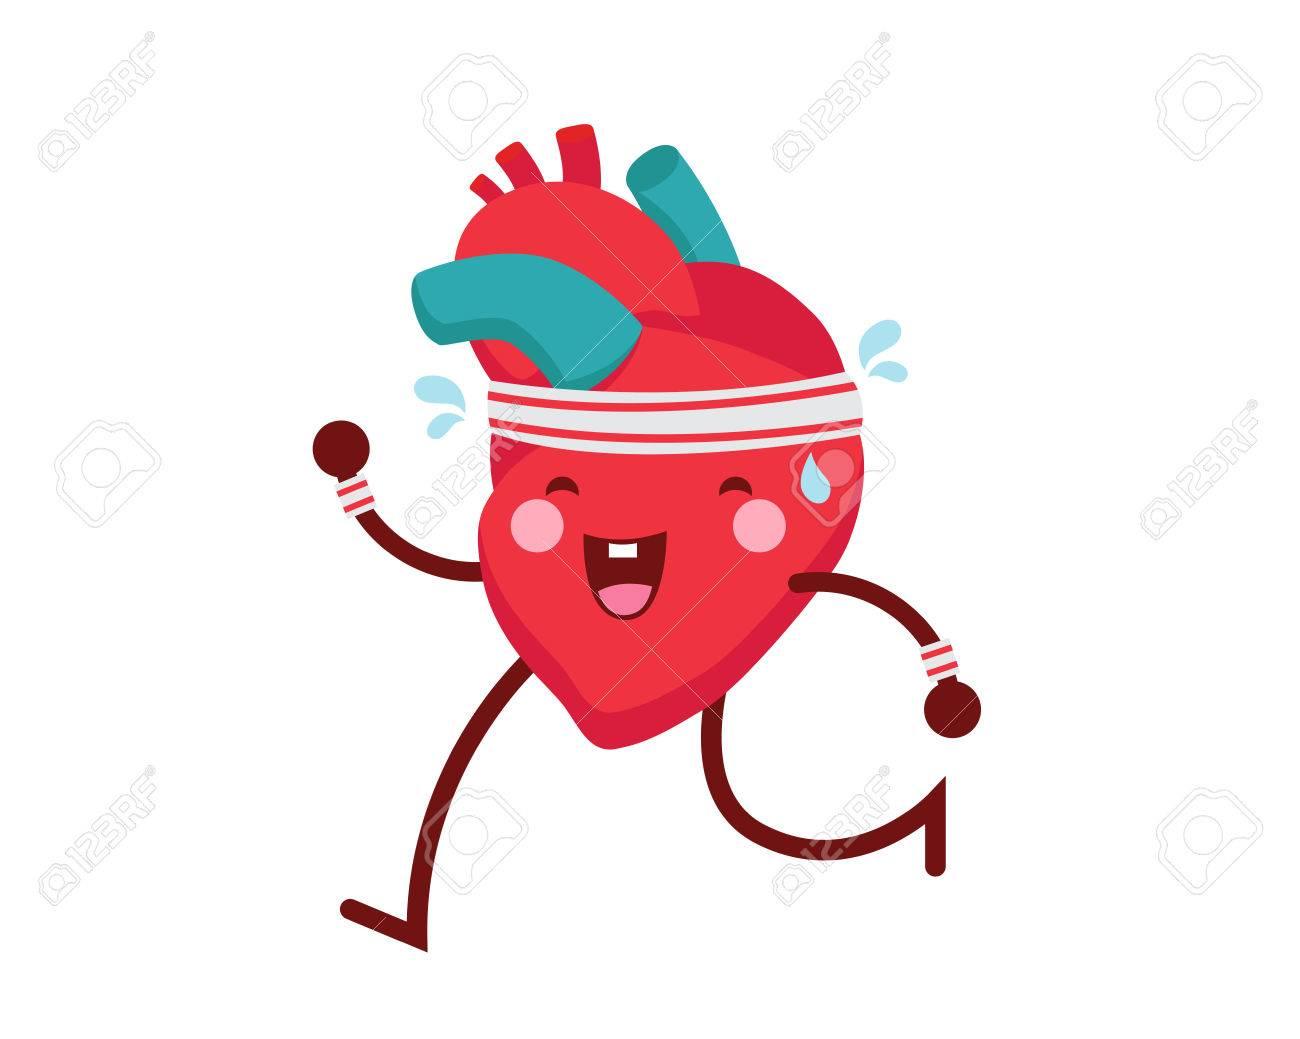 Healthy Happy And Cute Human Anatomy Illustration Cartoon Healthy